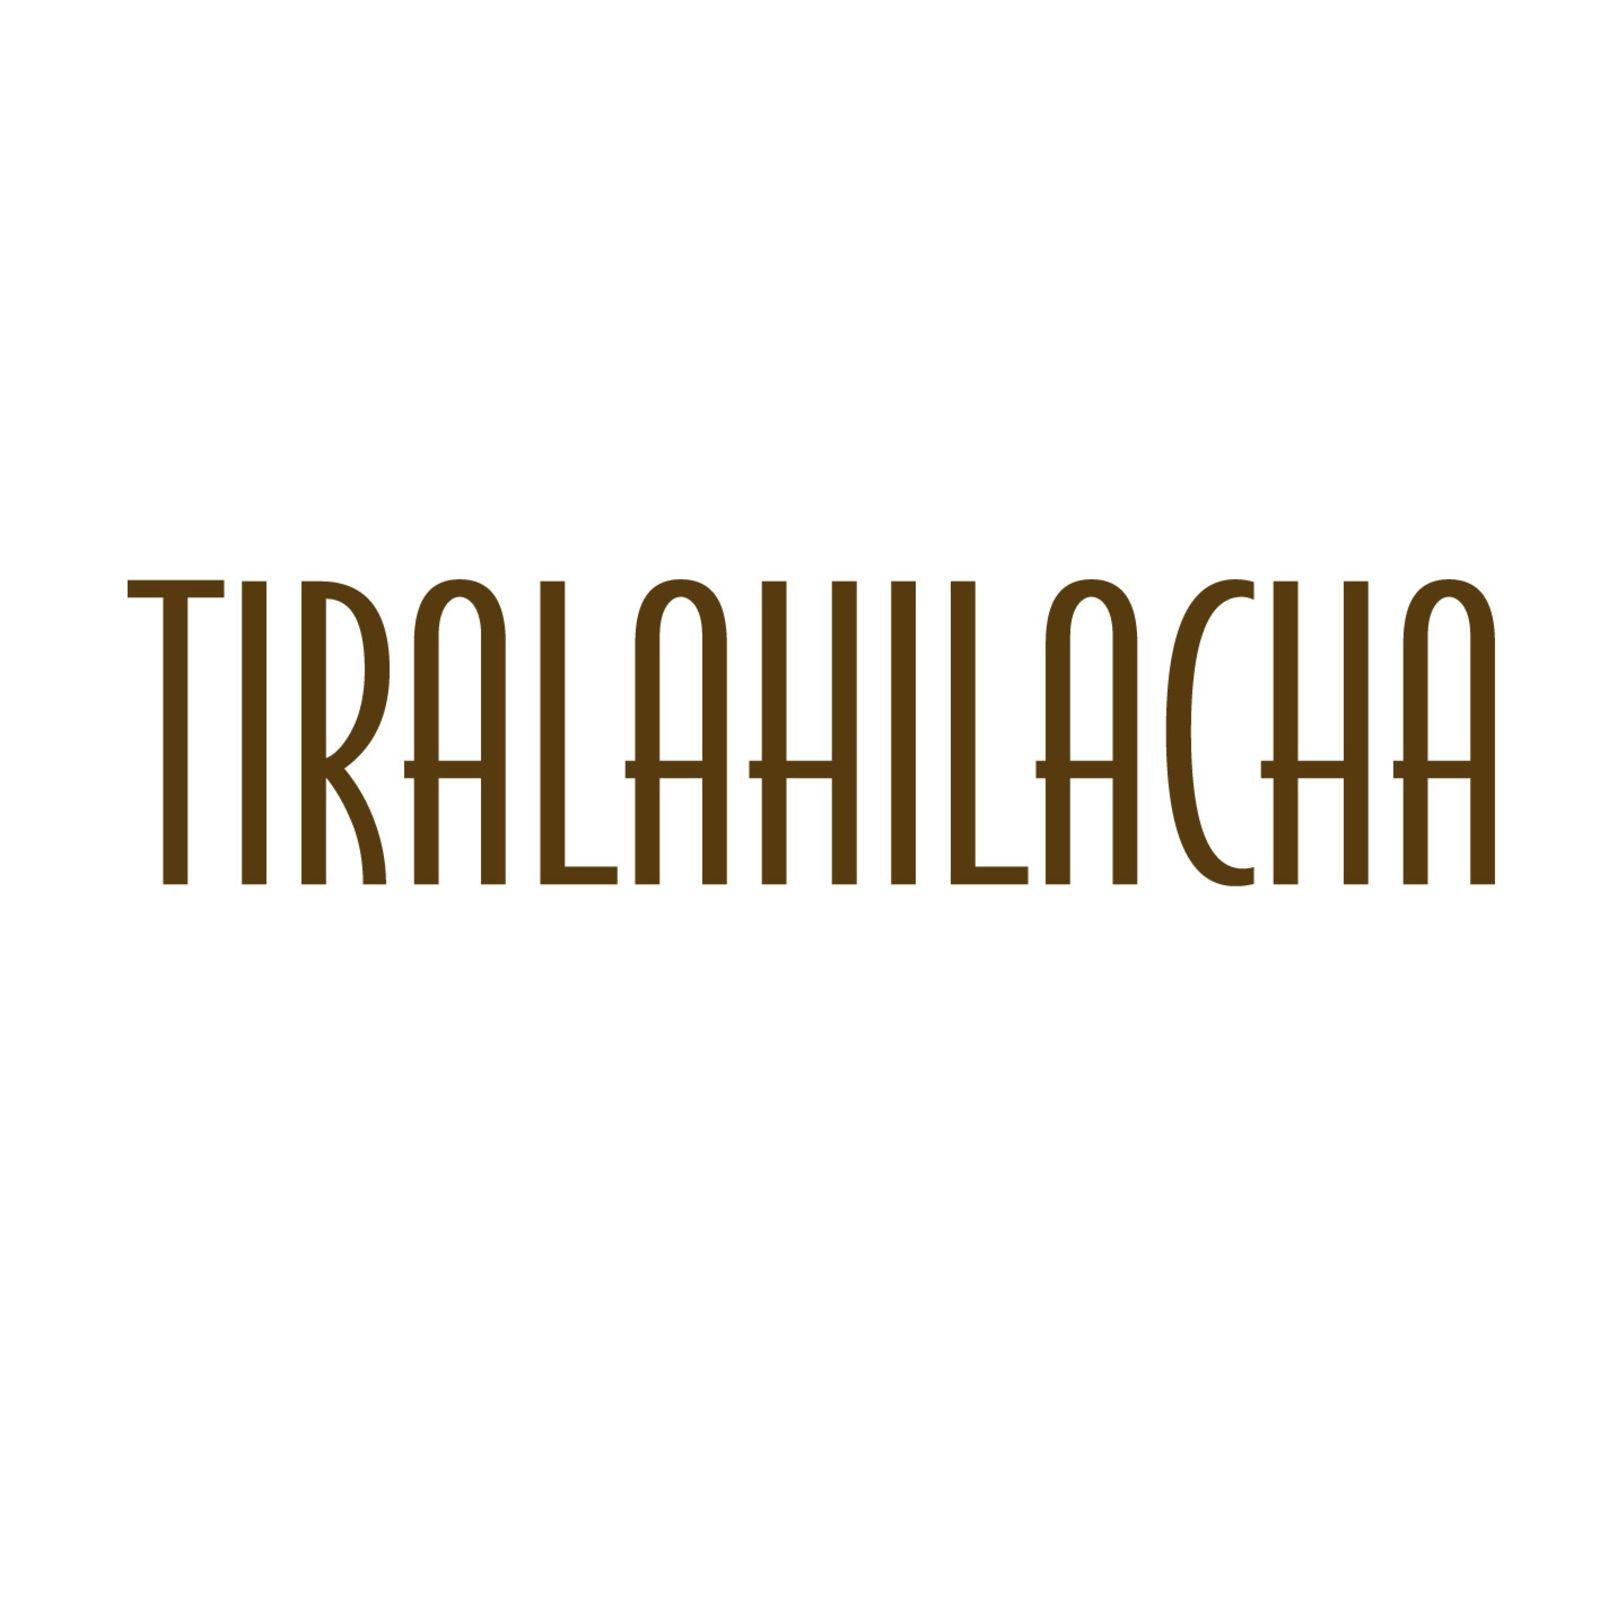 TIRALAHILACHA